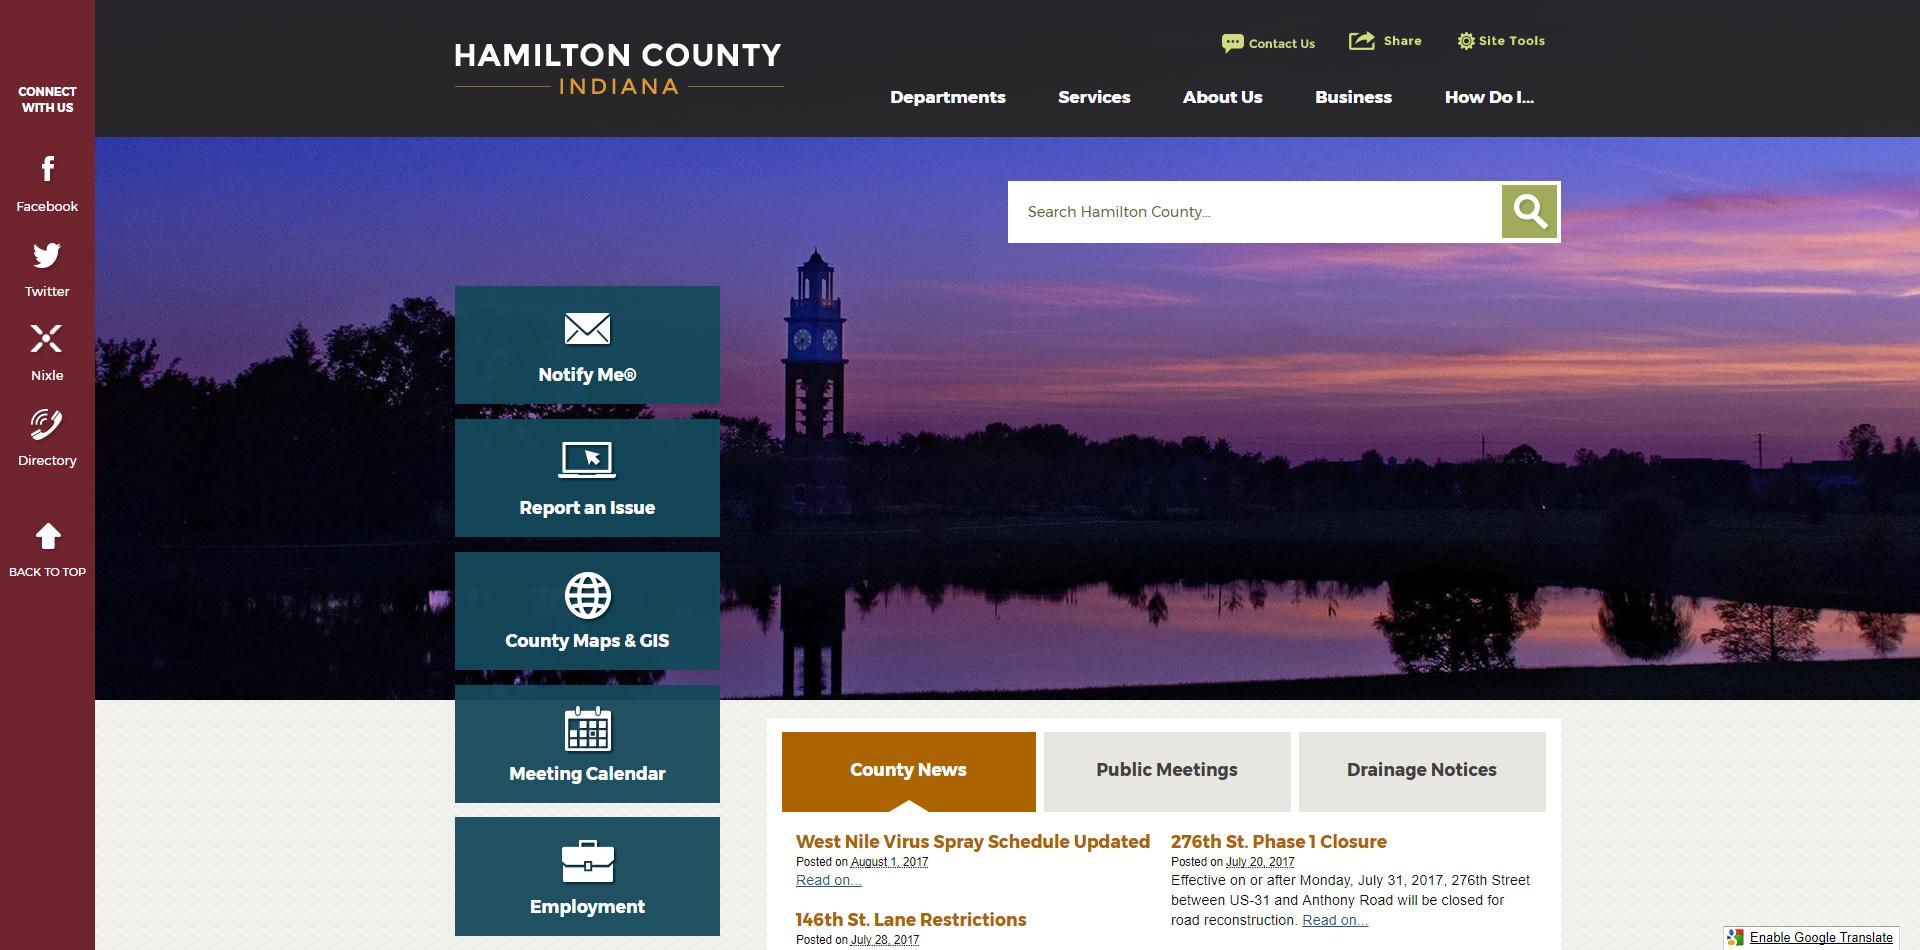 2017_Digital_Counties_Award_Winning_Website_CivicPlus_Hamilton_IN.png